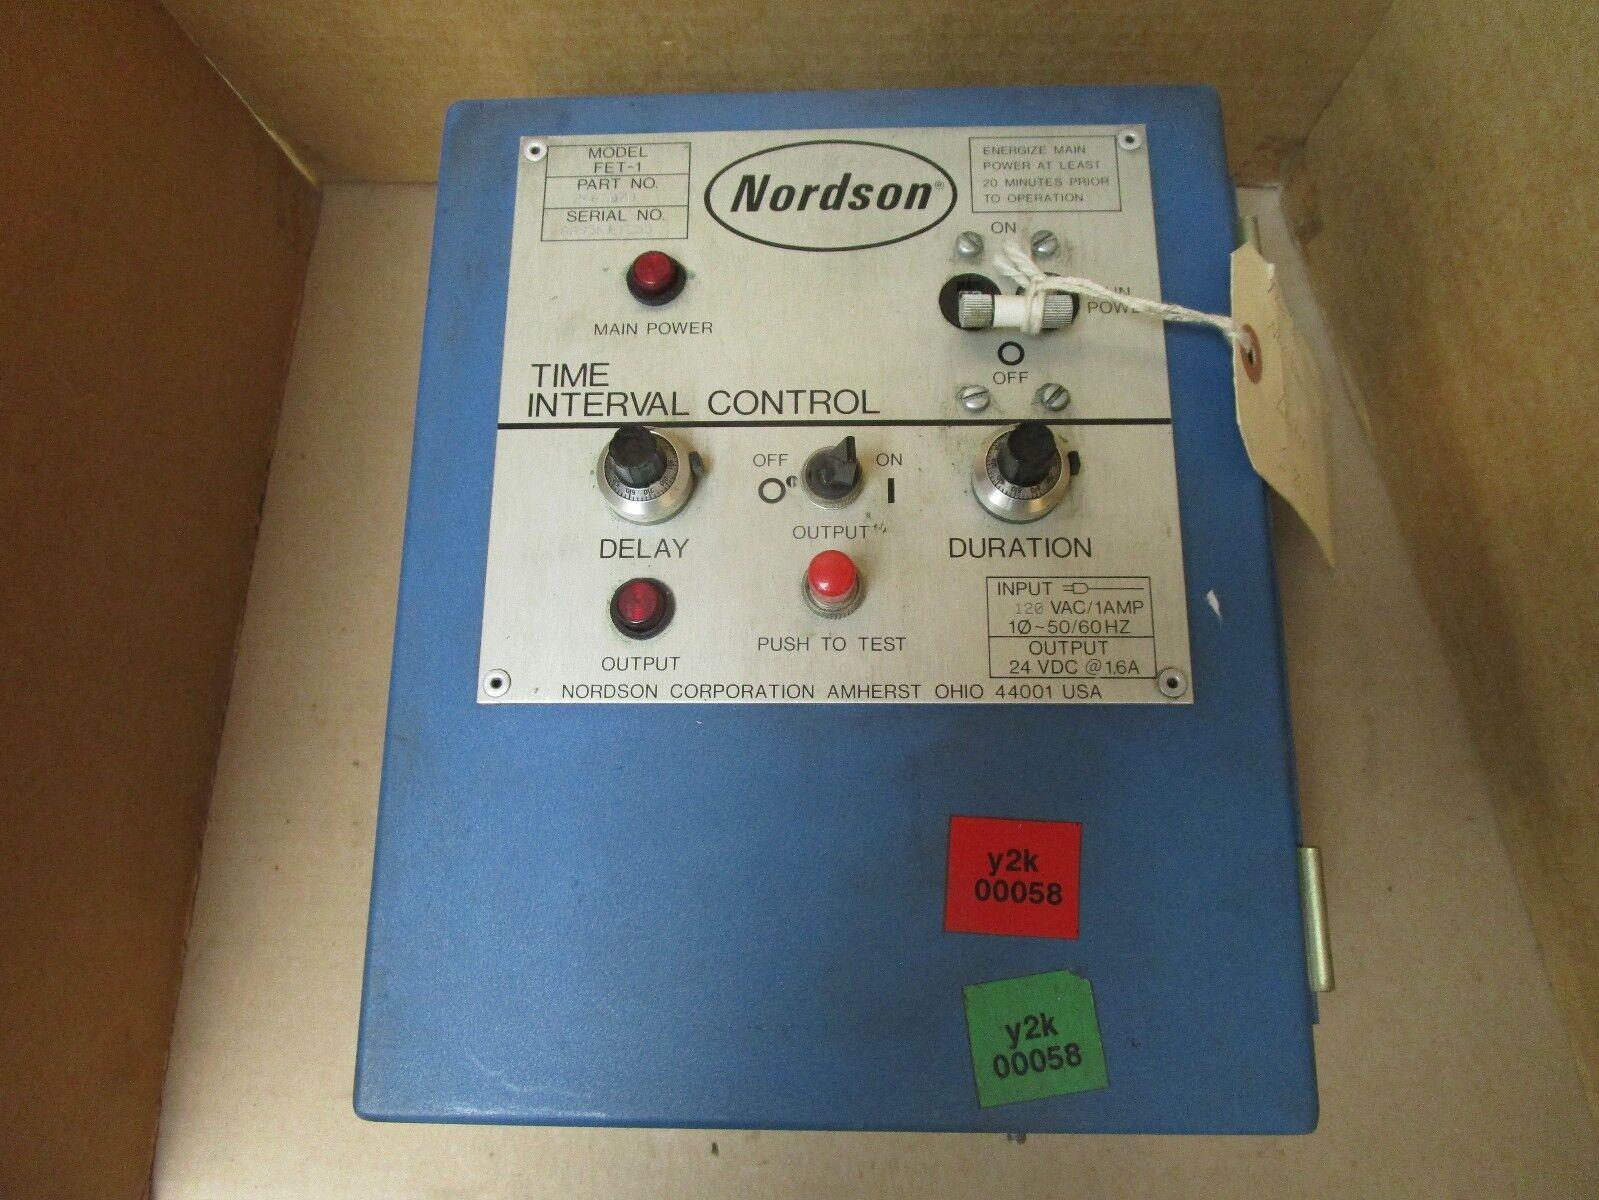 NORDSON TIME INTERVAL CONTROL HOT MELT FET-1 246107D